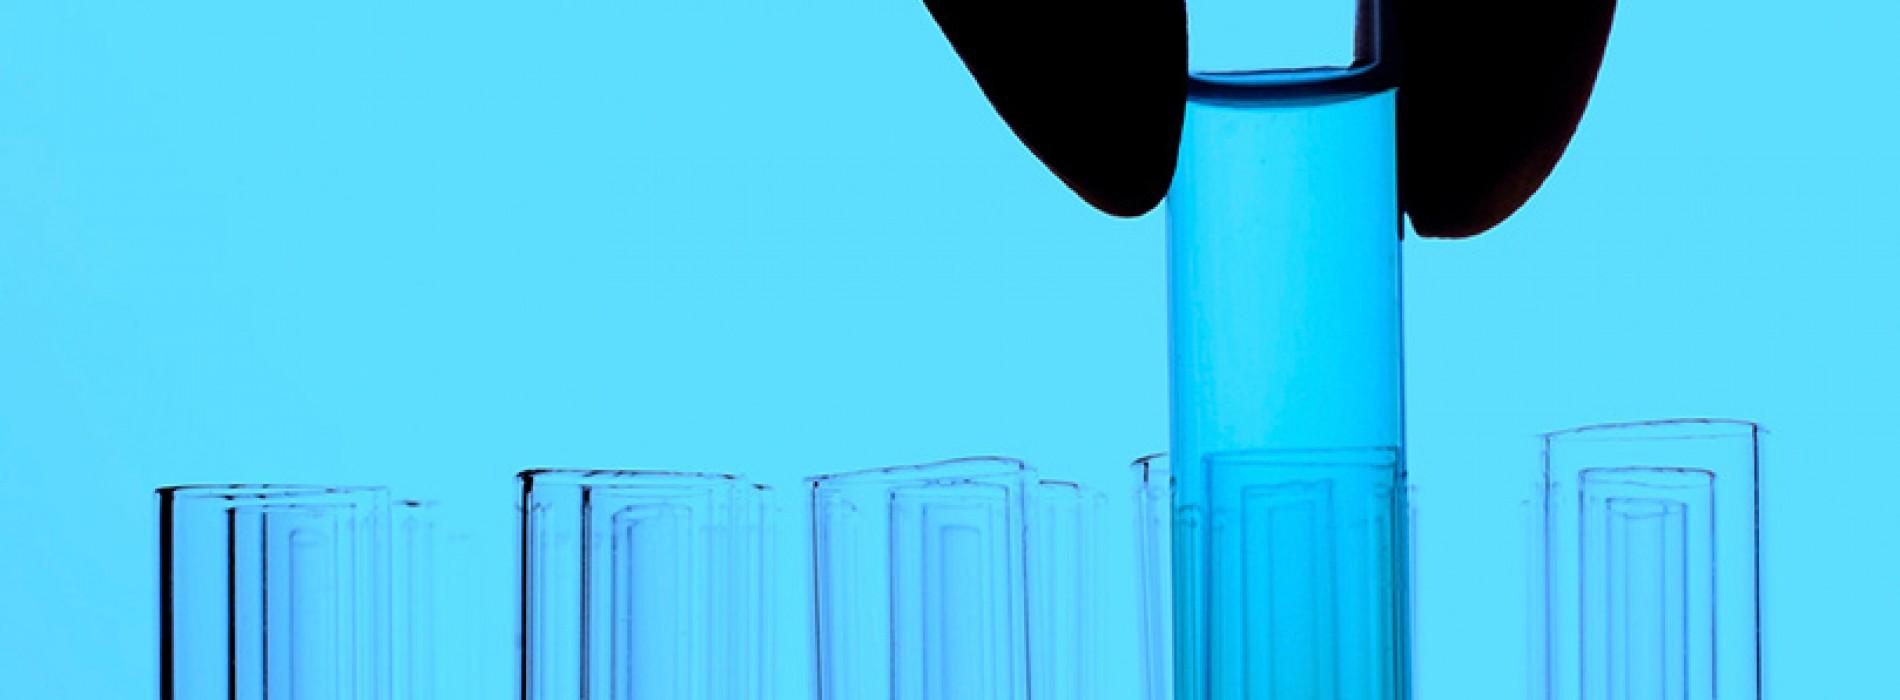 CSK-TEAM Taller de Bioemprendimiento